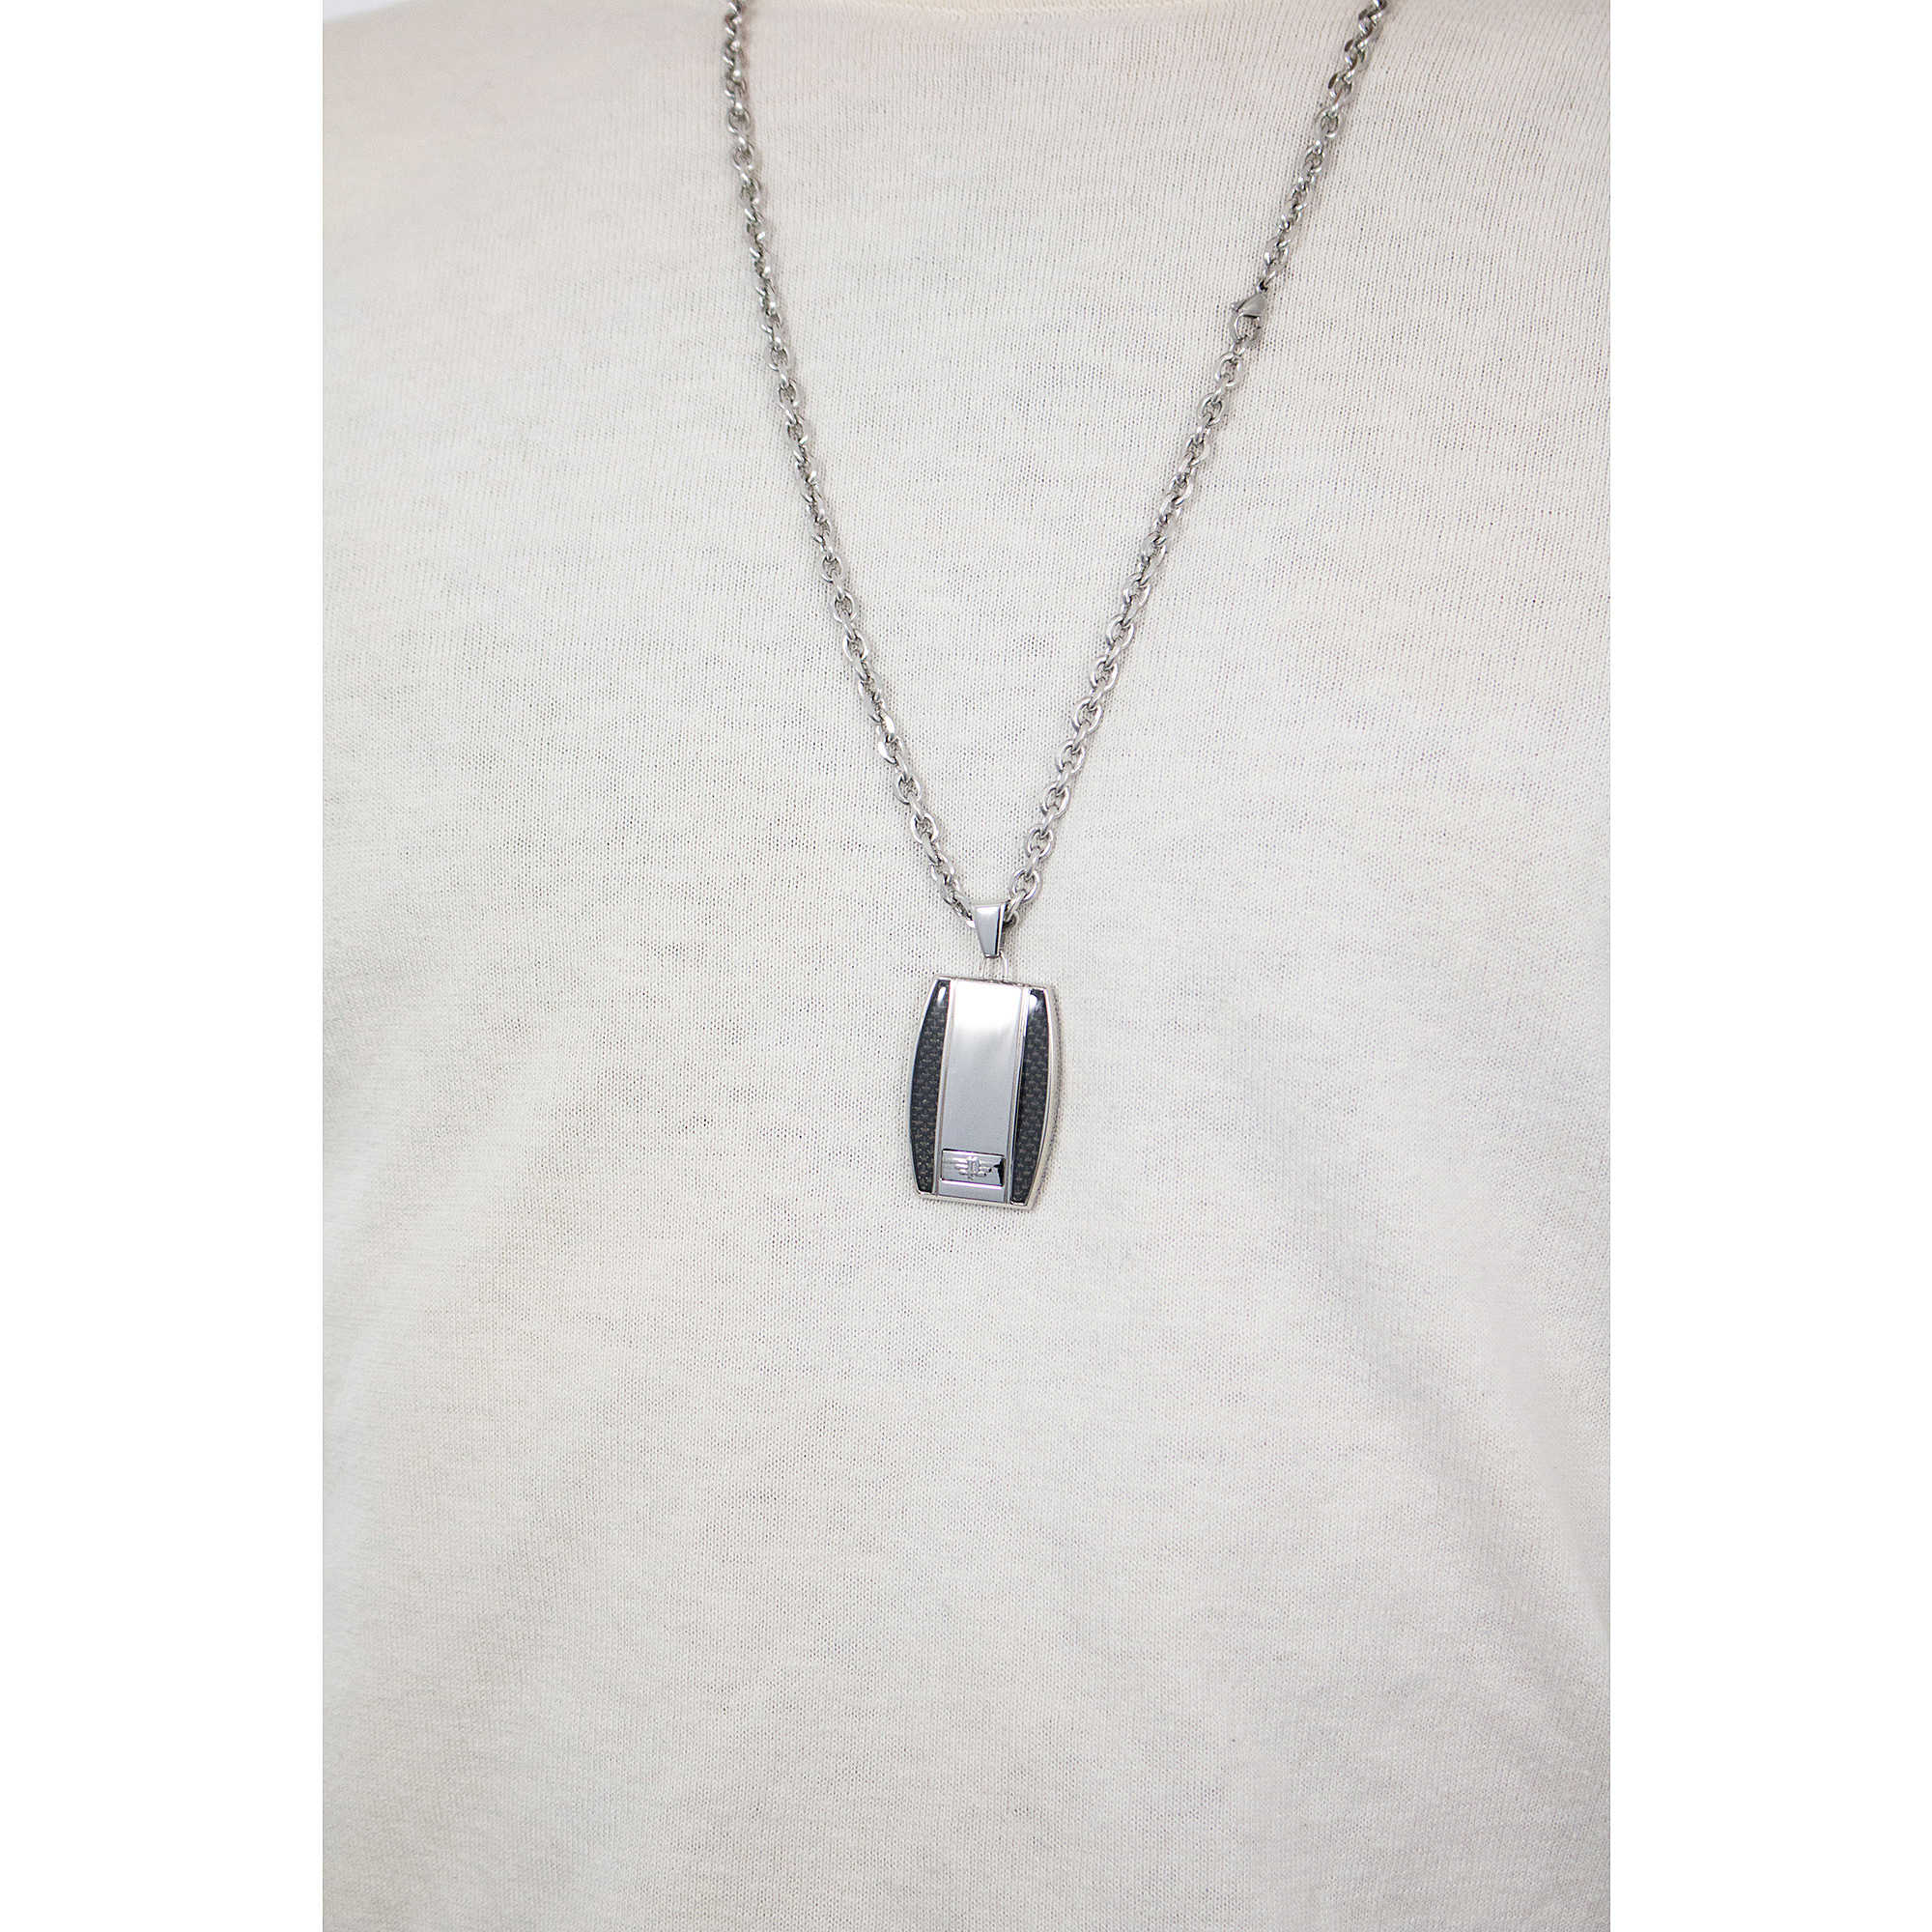 crystals quartz precious plated en with and necklace brass pilgrim image ferrari stones gold